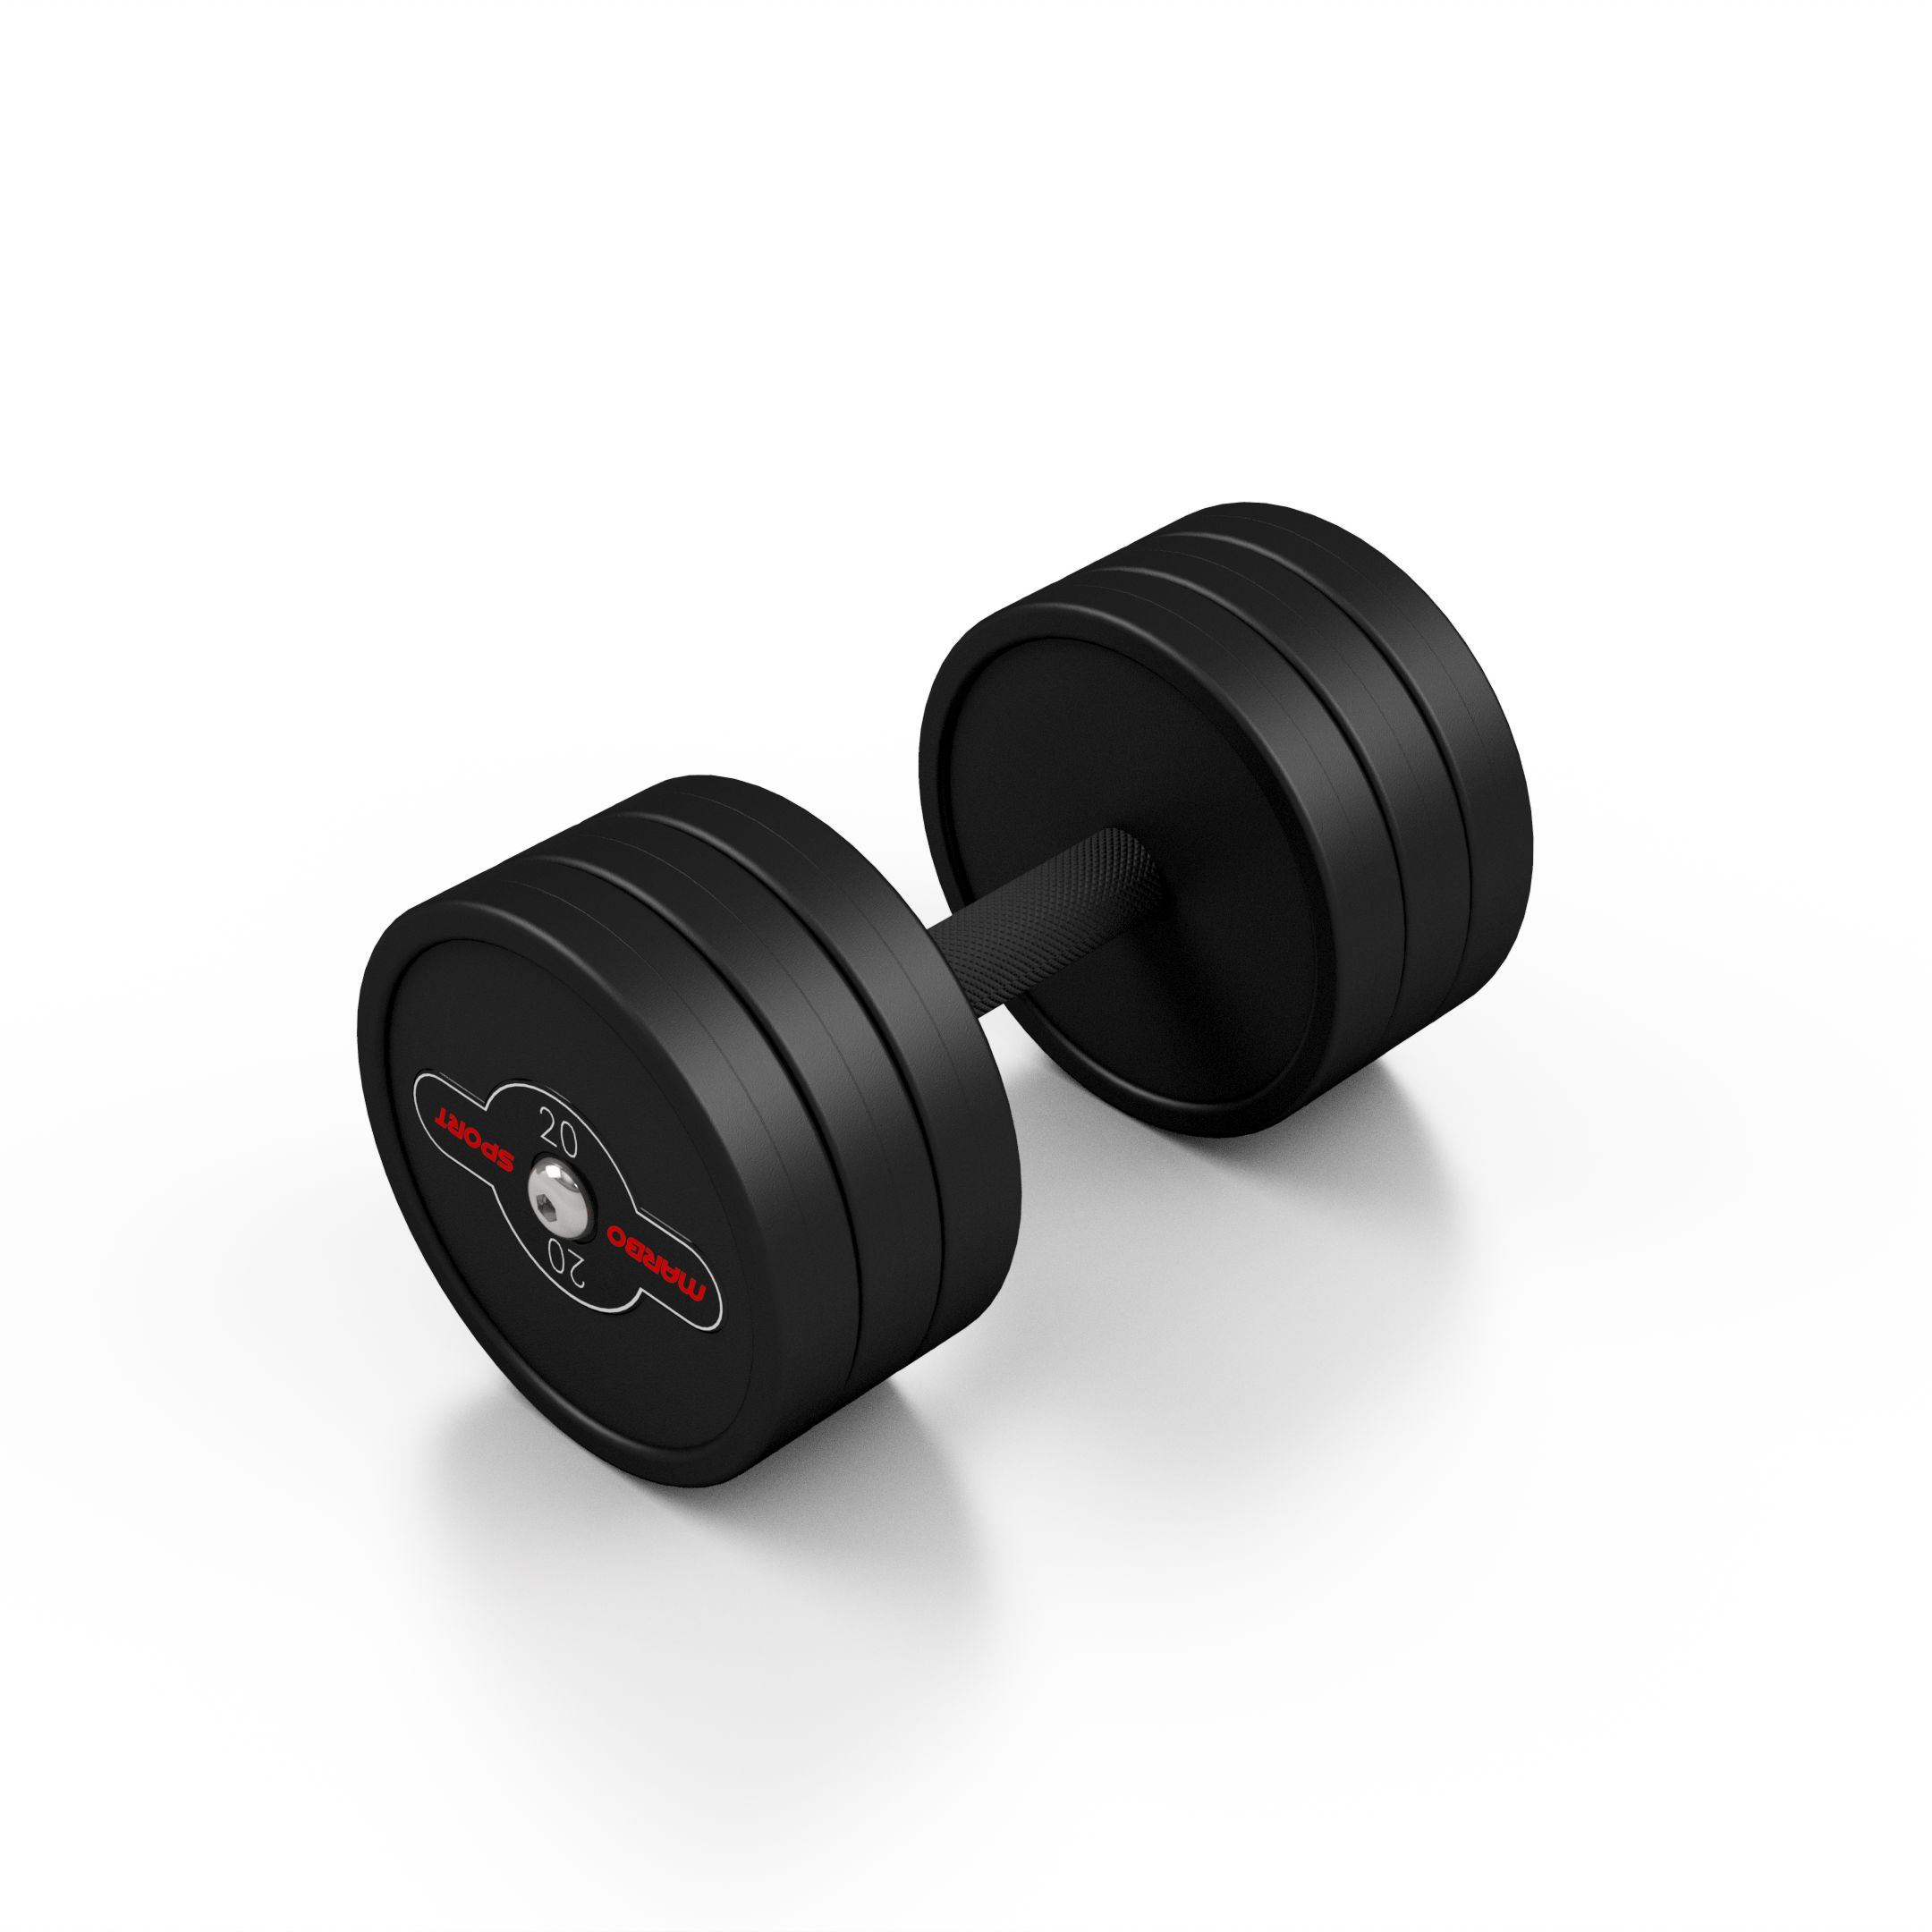 Hantla stalowa gumowana 20 kg czarny mat - Marbo Sport - 20 kg